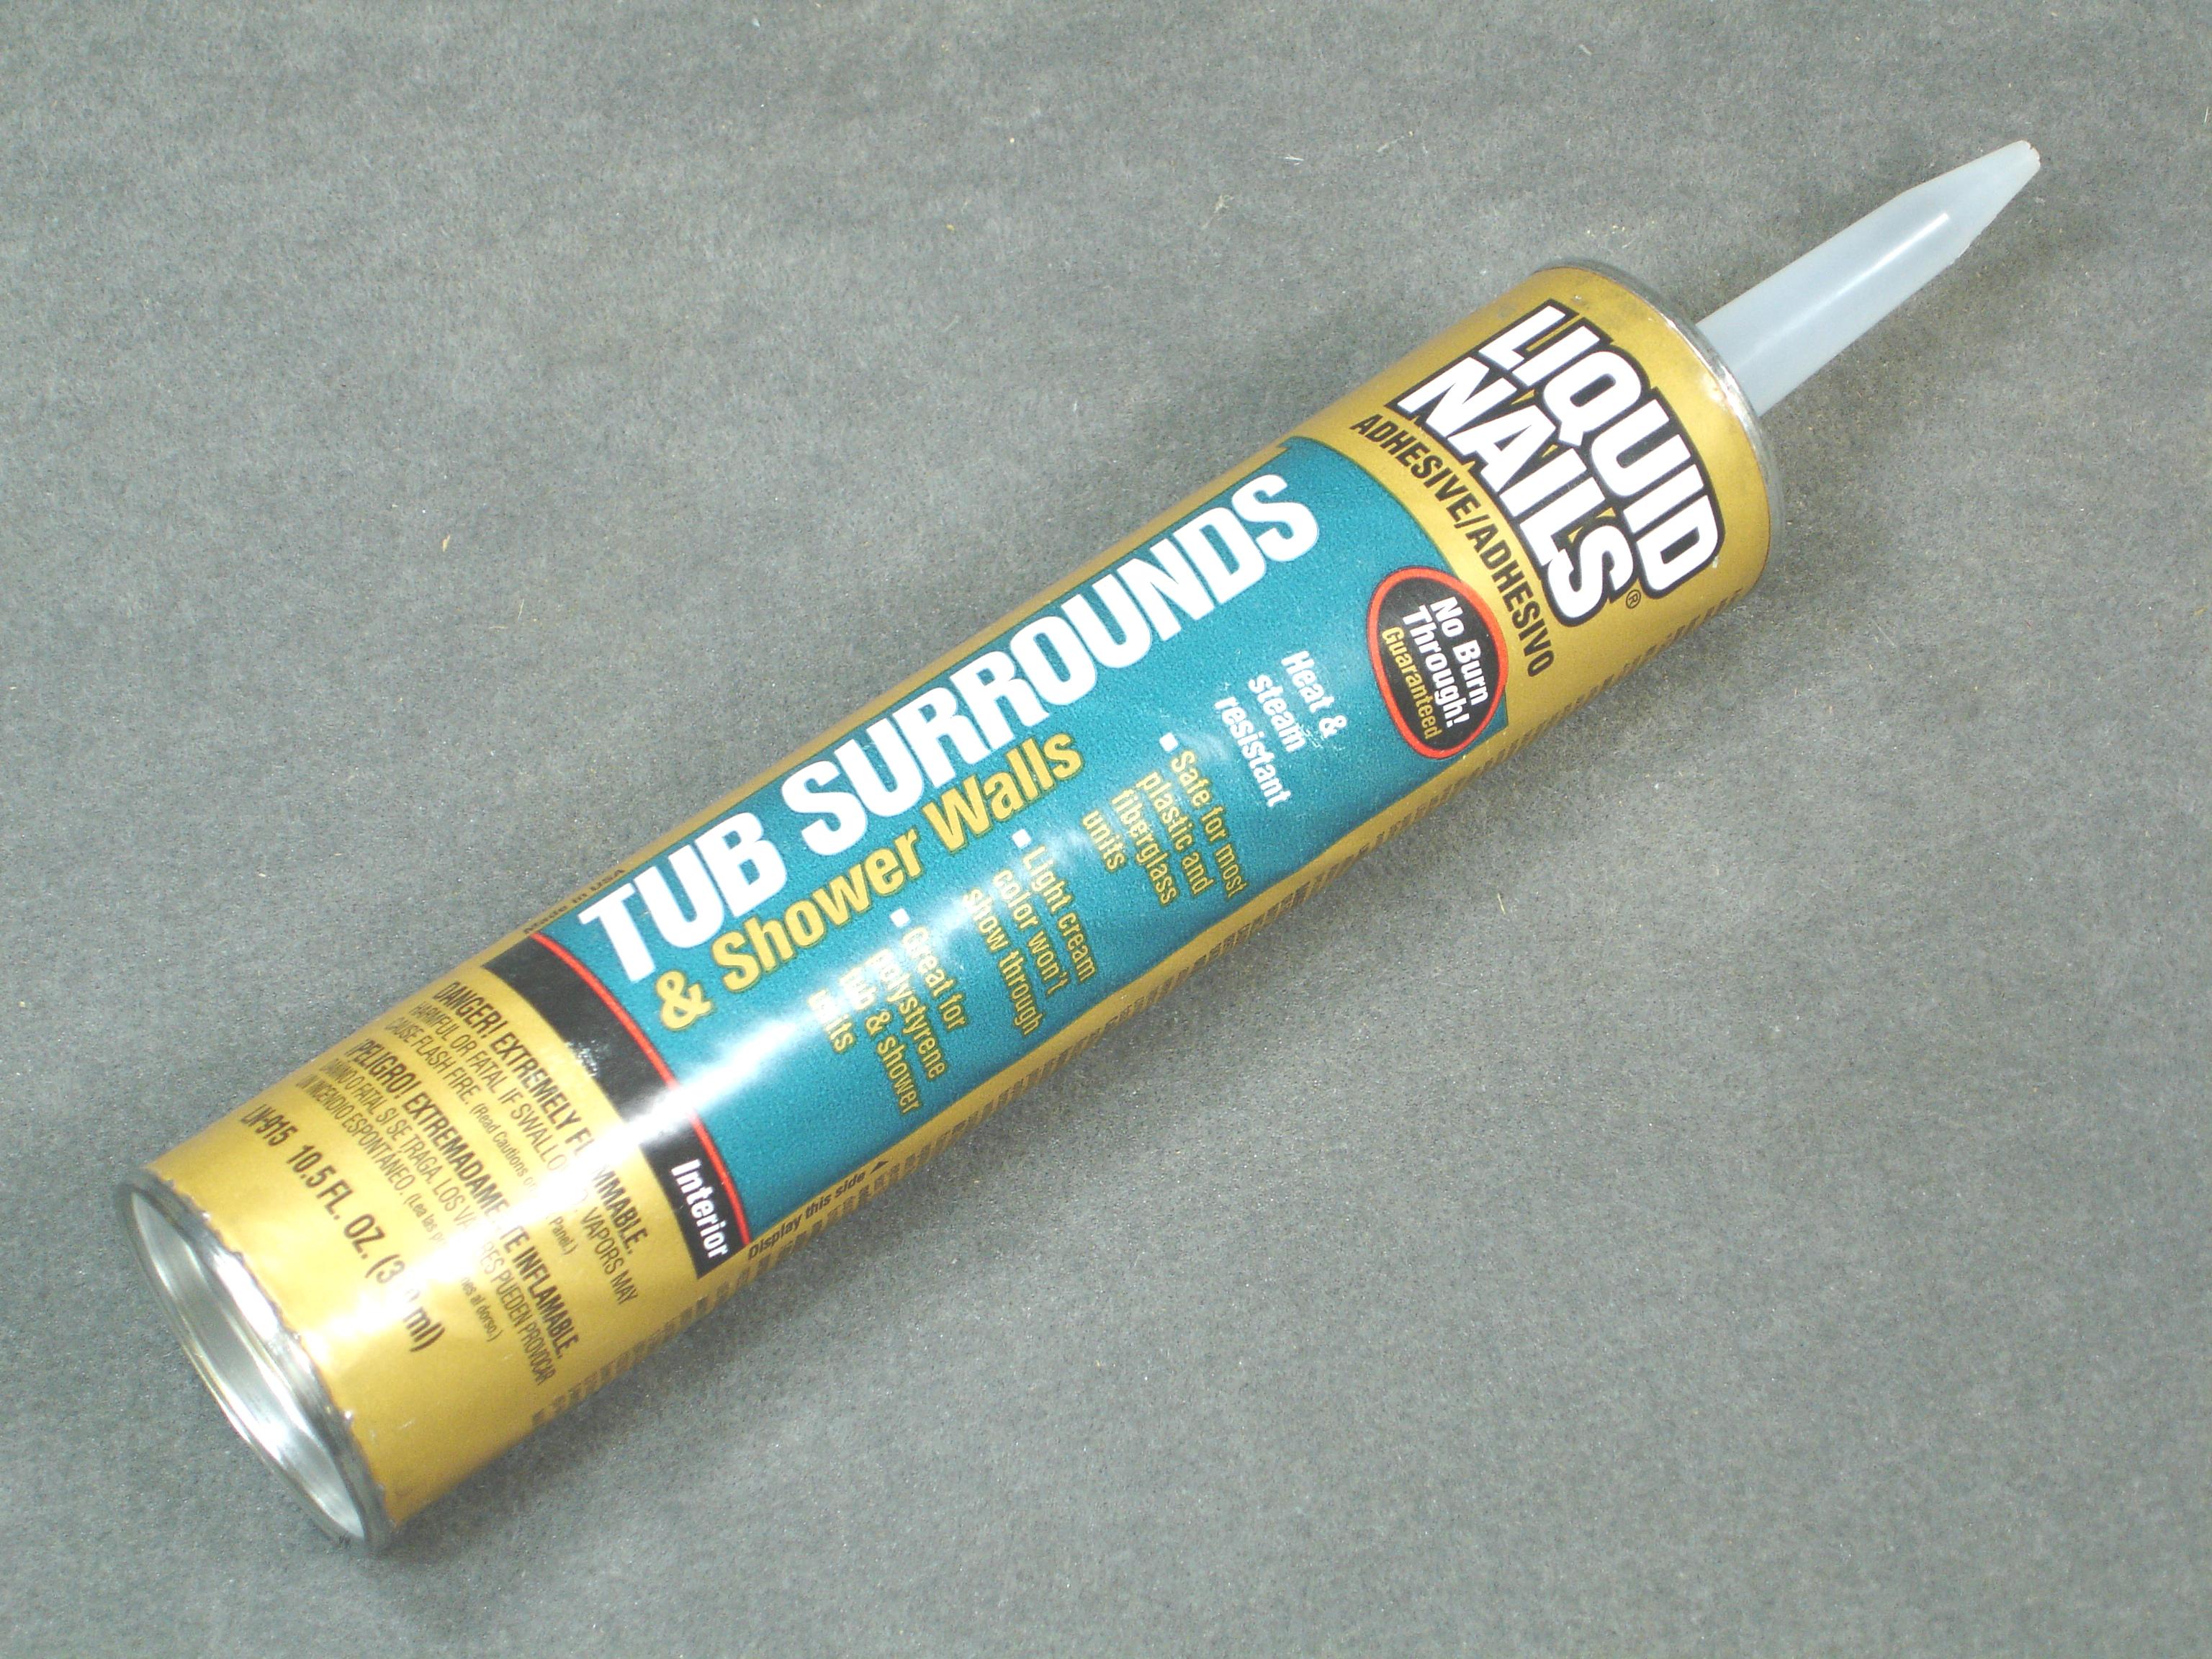 LIQUID NAIL FOR TUB SURROUNDS - Royal Durham Supply